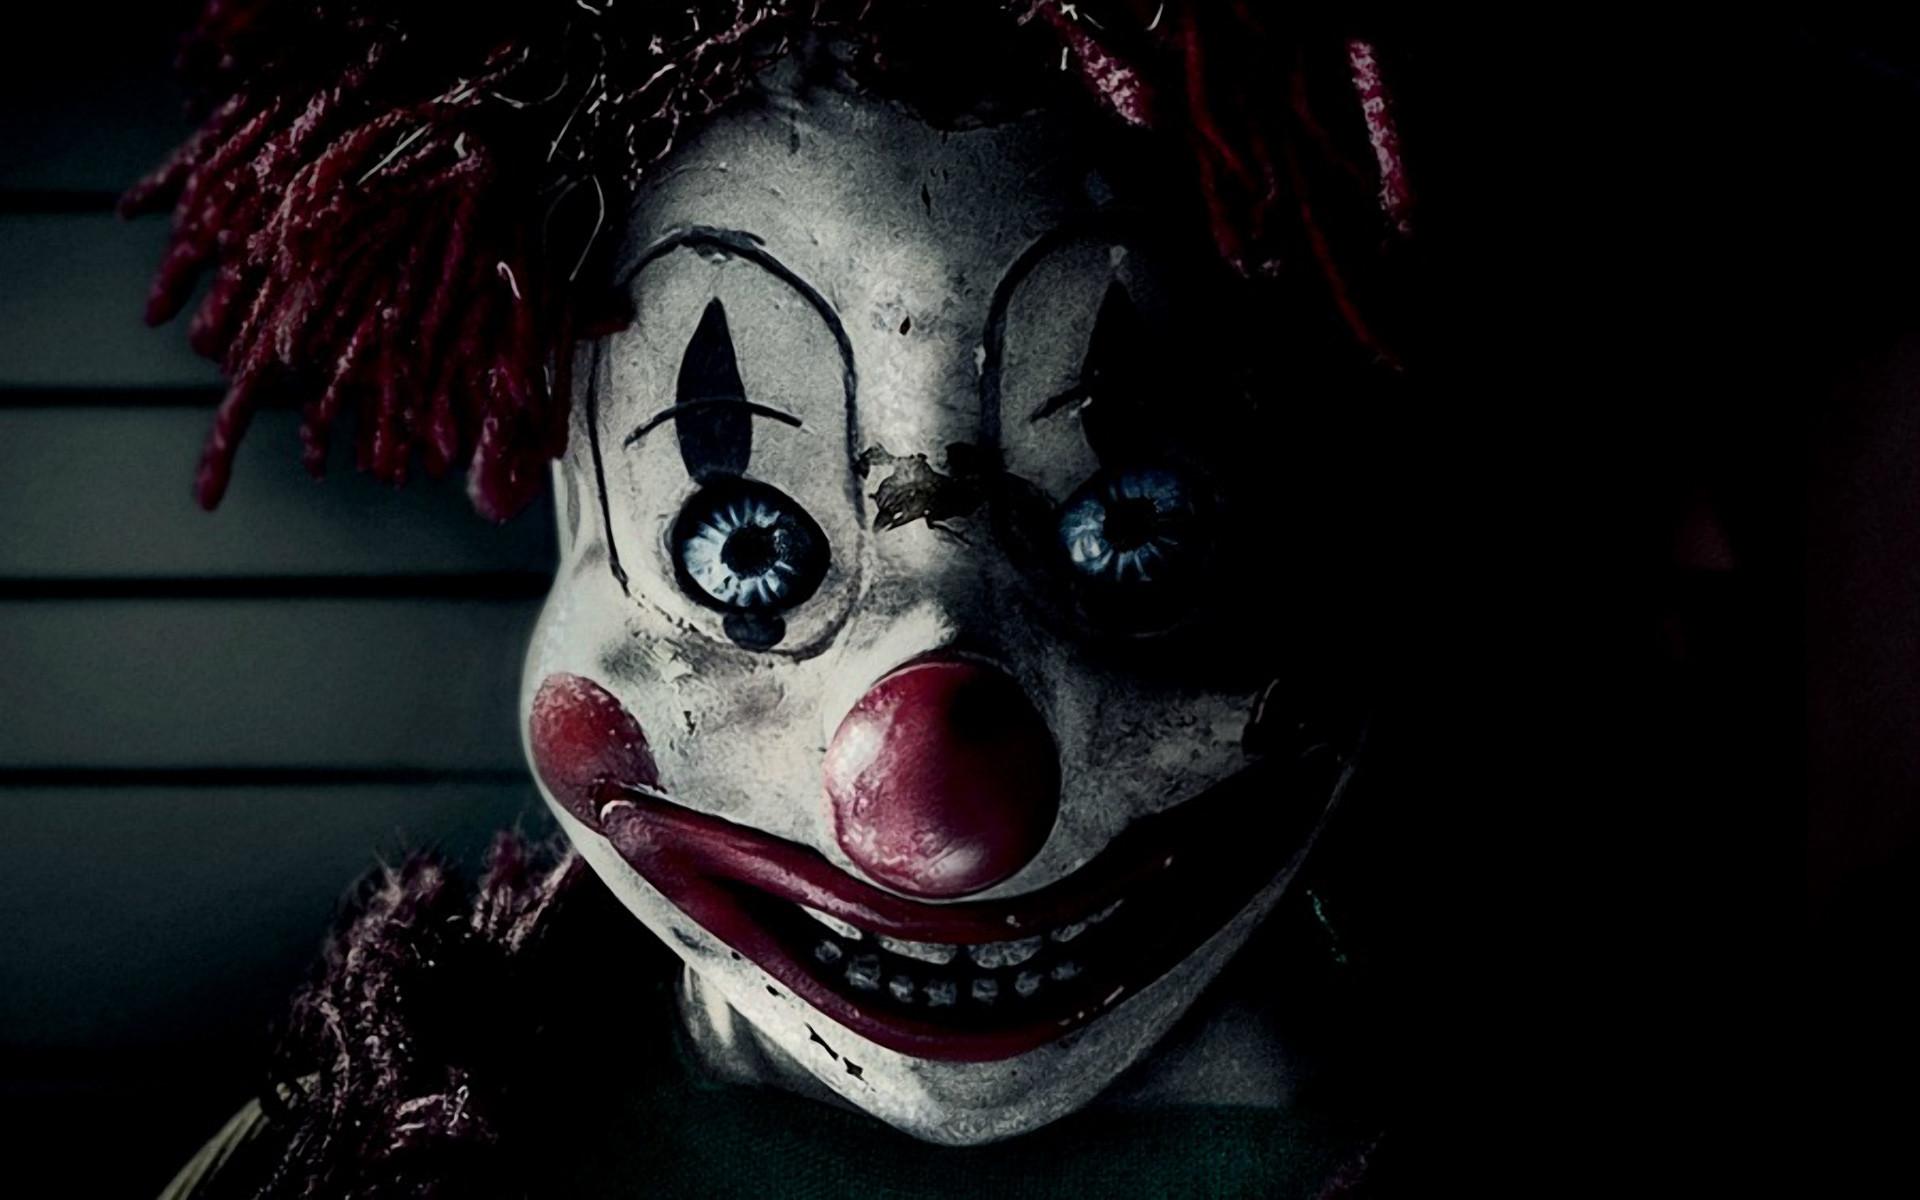 Classic Horror Movie Wallpaper 69 Images